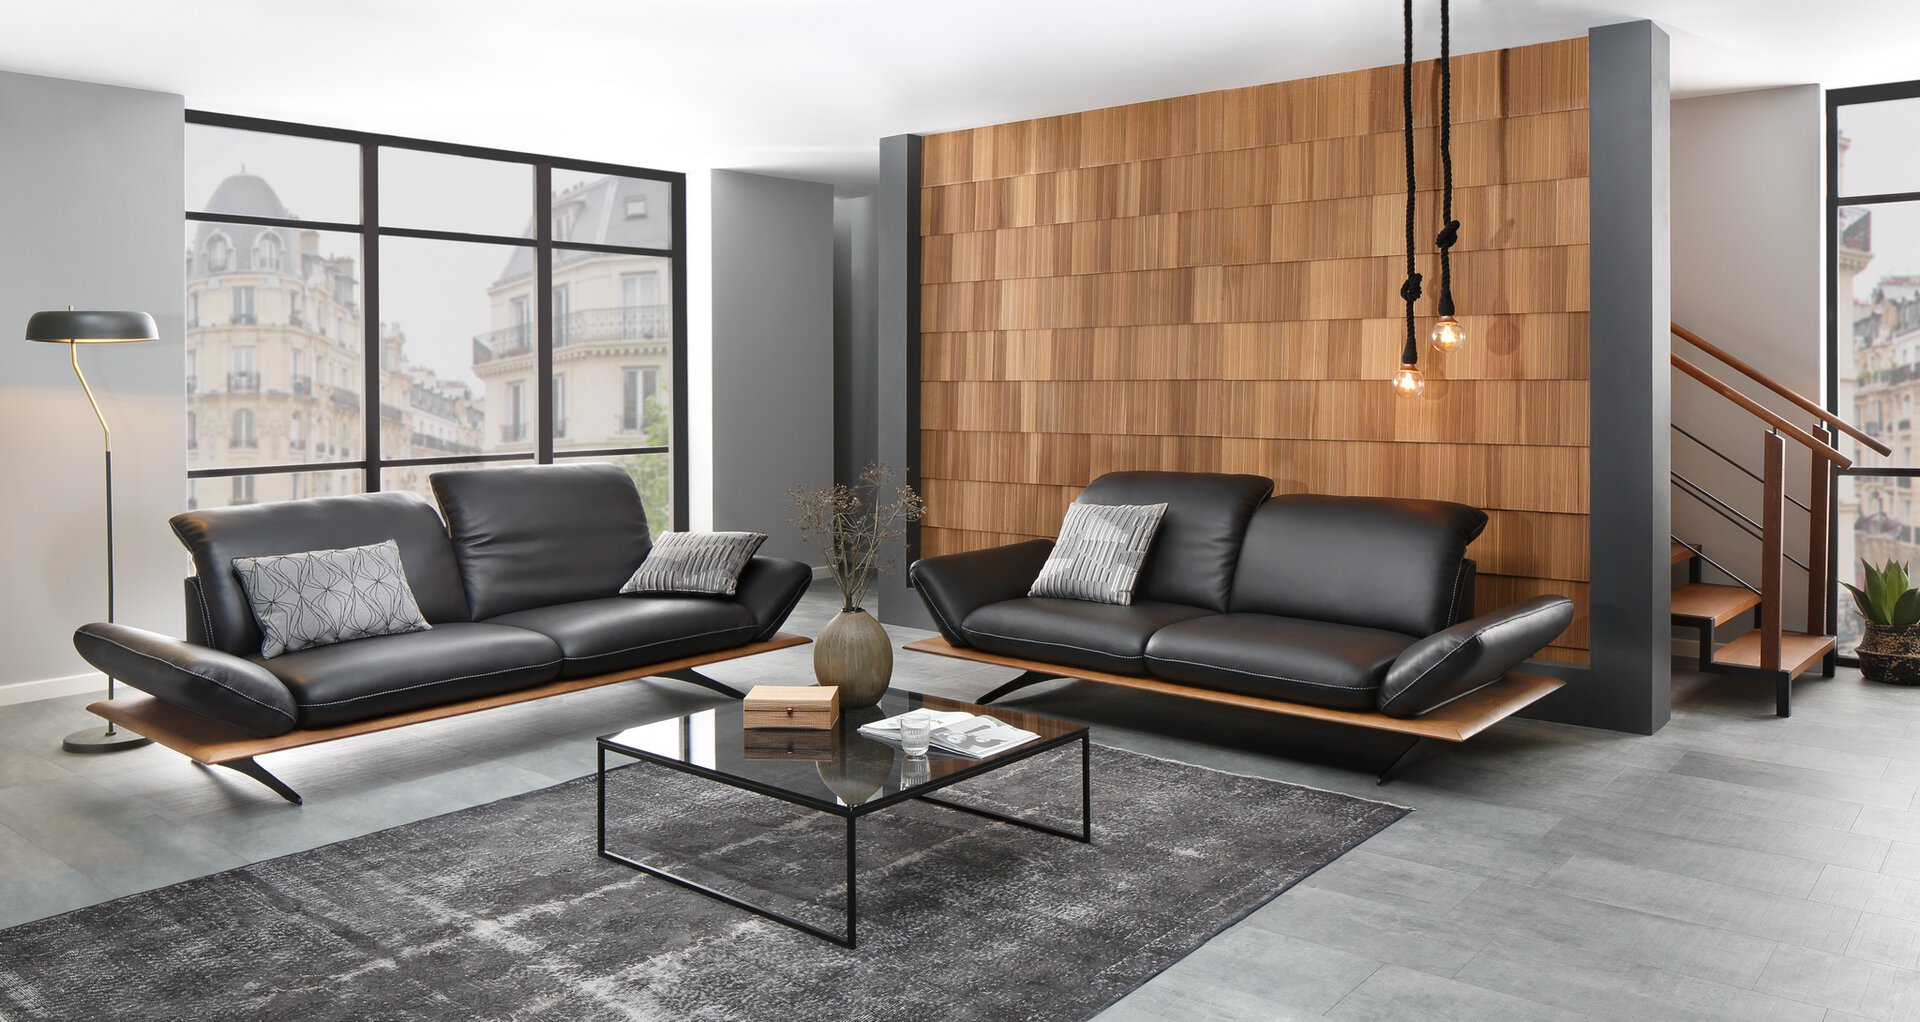 Sofa 2,5-Sitzer 27620 W.Schillig Leder schwarz 110 x 82 x 240 cm